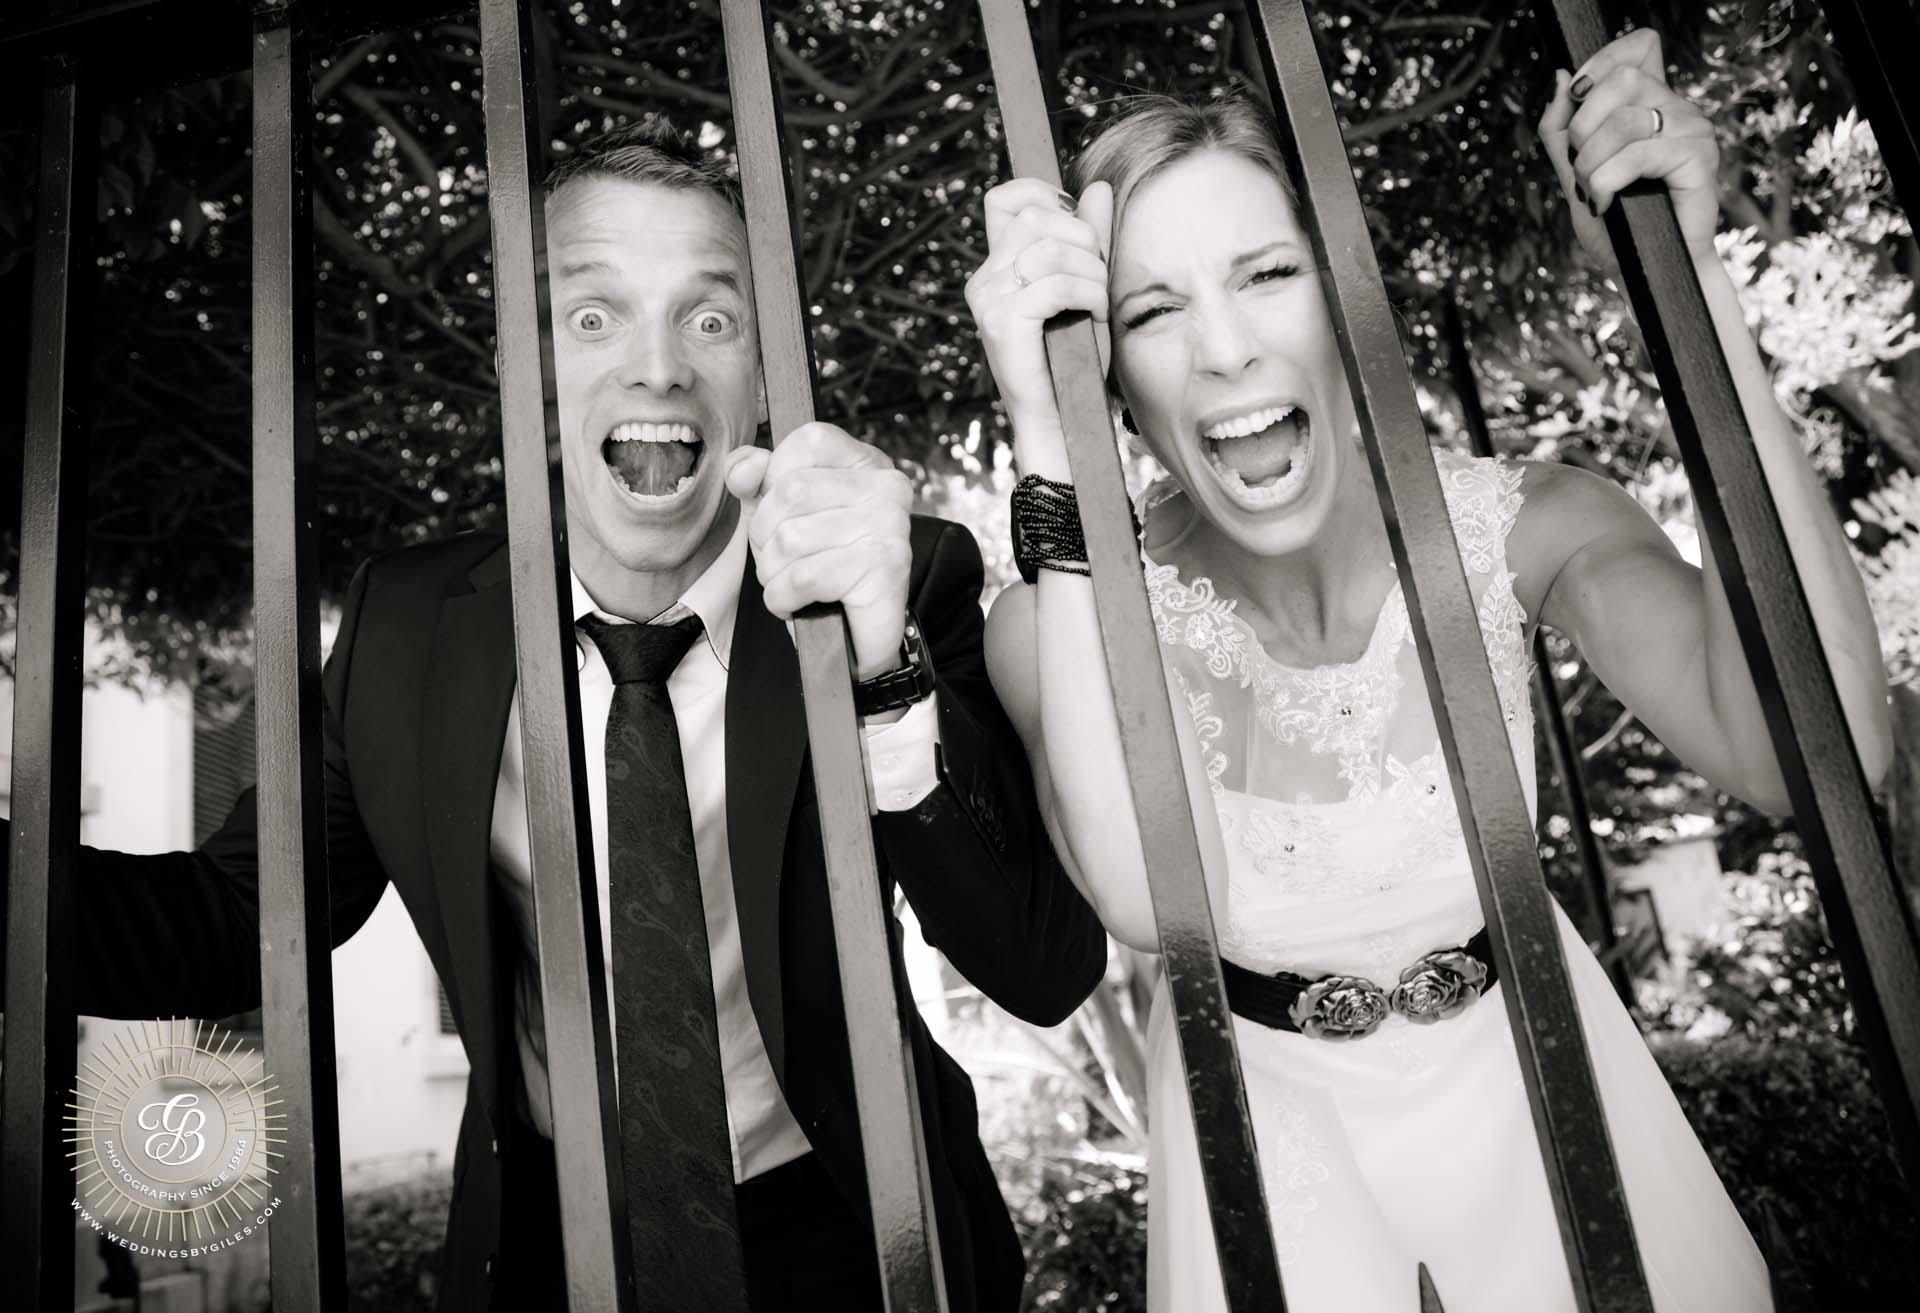 newlyweds behind bars